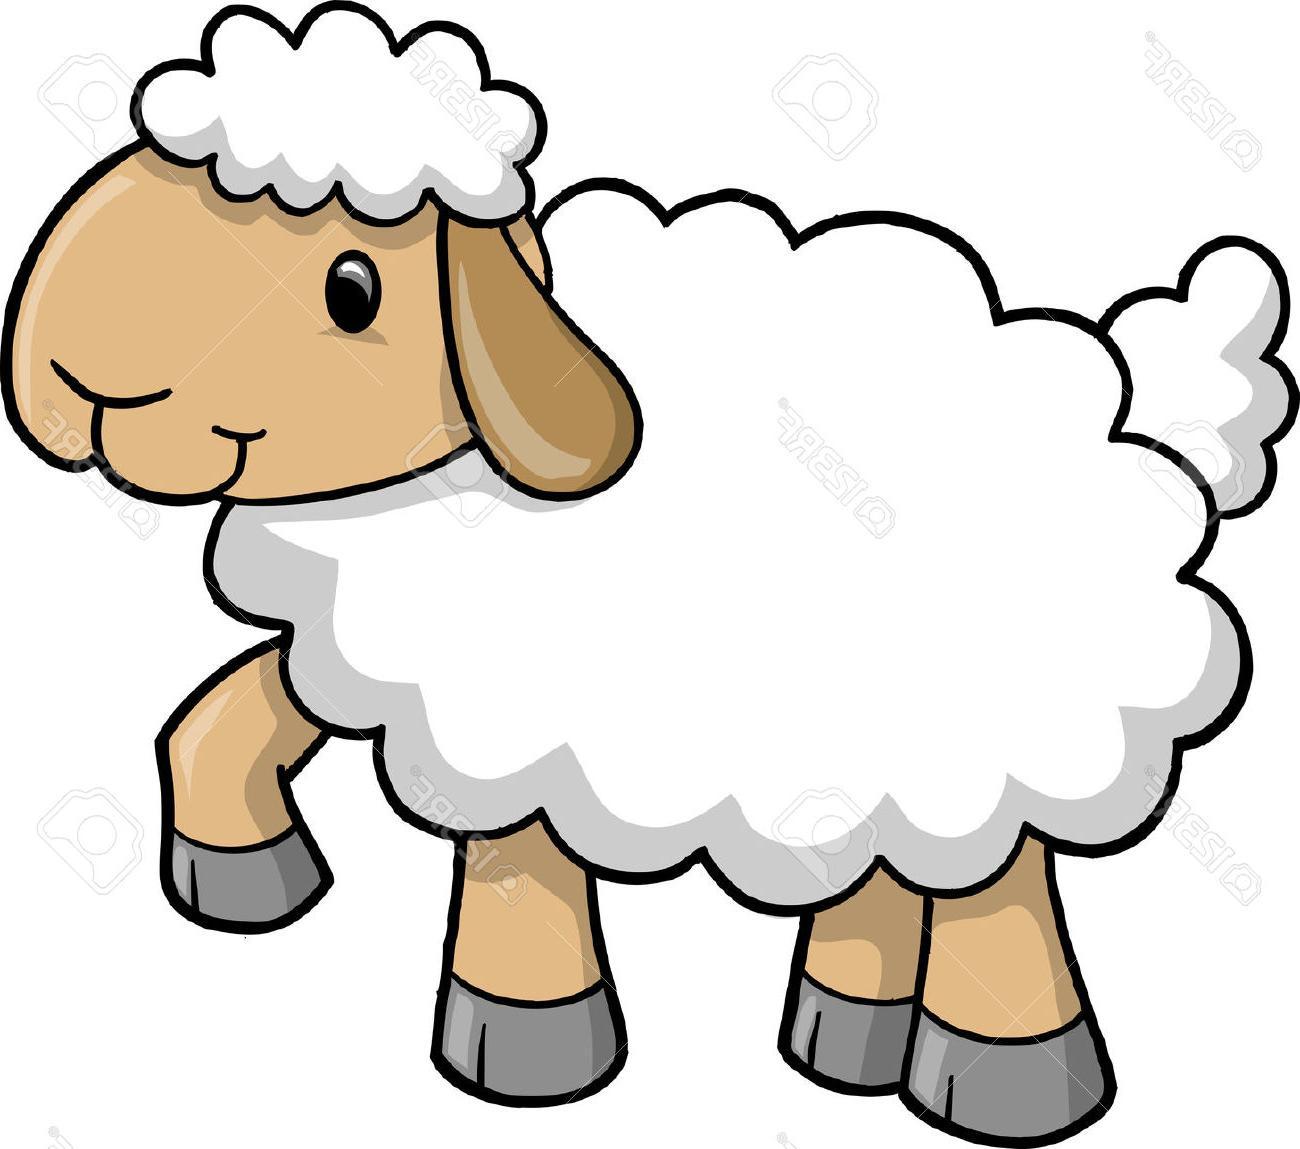 1300x1149 Cartoon Sheep Pictures Clip Art C9a7457f5a117293f2cddda205cfa4b9